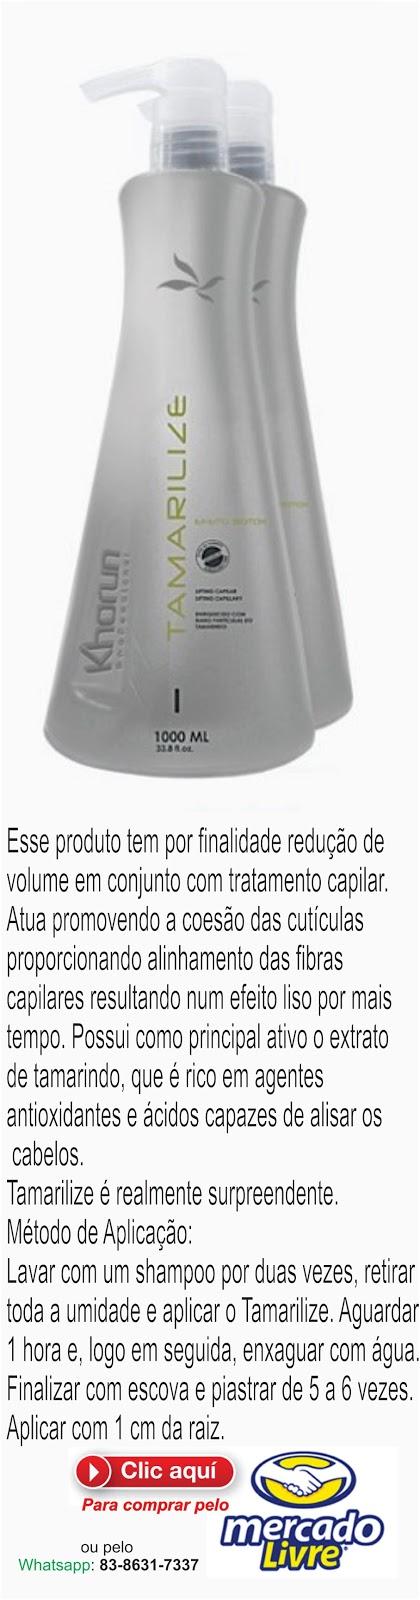 http://produto.mercadolivre.com.br/MLB-728423975-khorun-tamarilize-1ltro-_JM